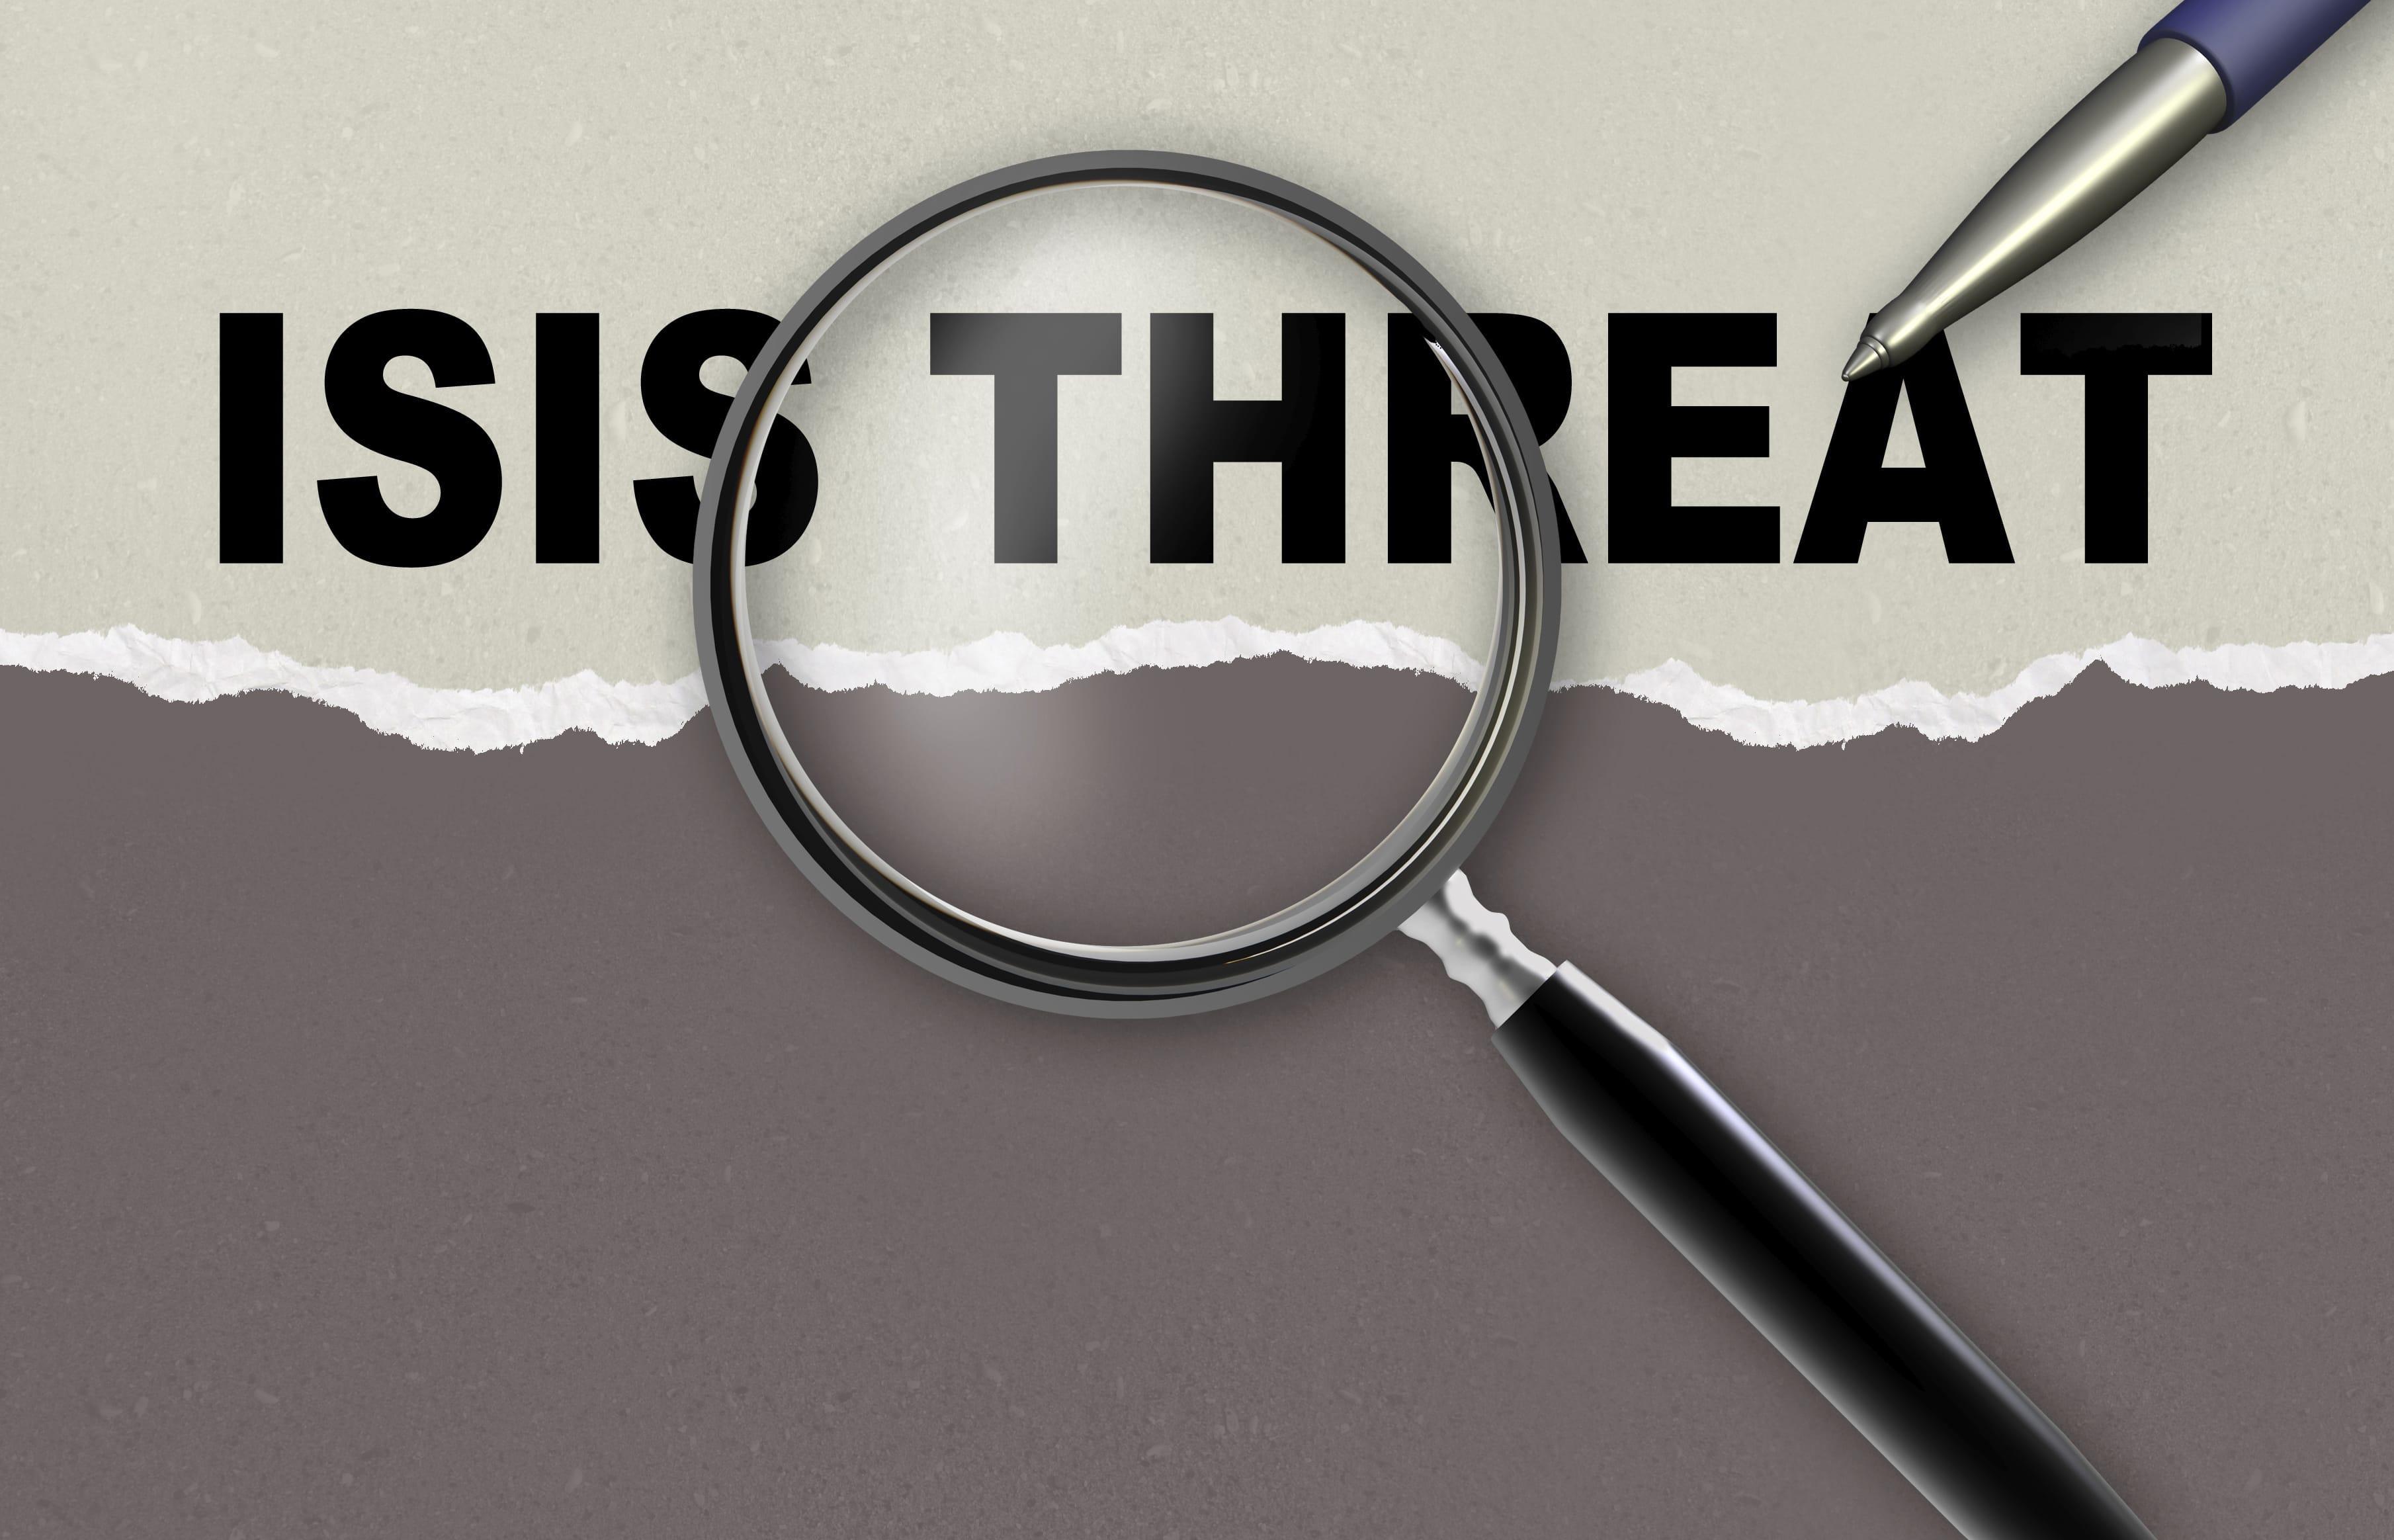 Isil terrorist group essay